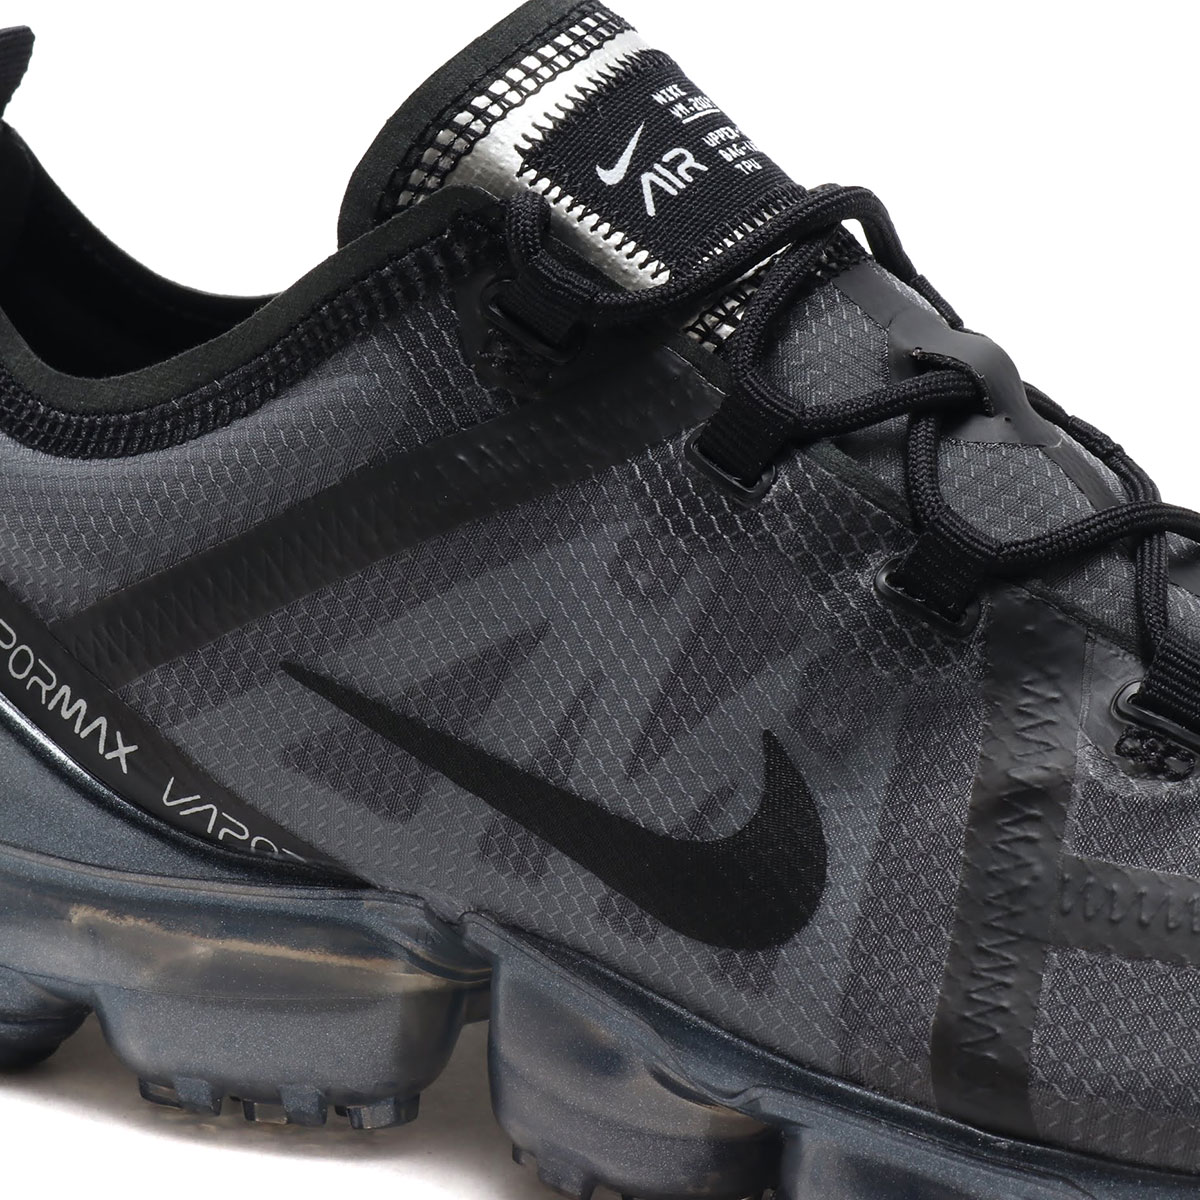 6b1a0ffc NIKE AIR VAPORMAX 2019 (Nike air vapor max 2019) BLACK/BLACK-BLACK 19FA-I